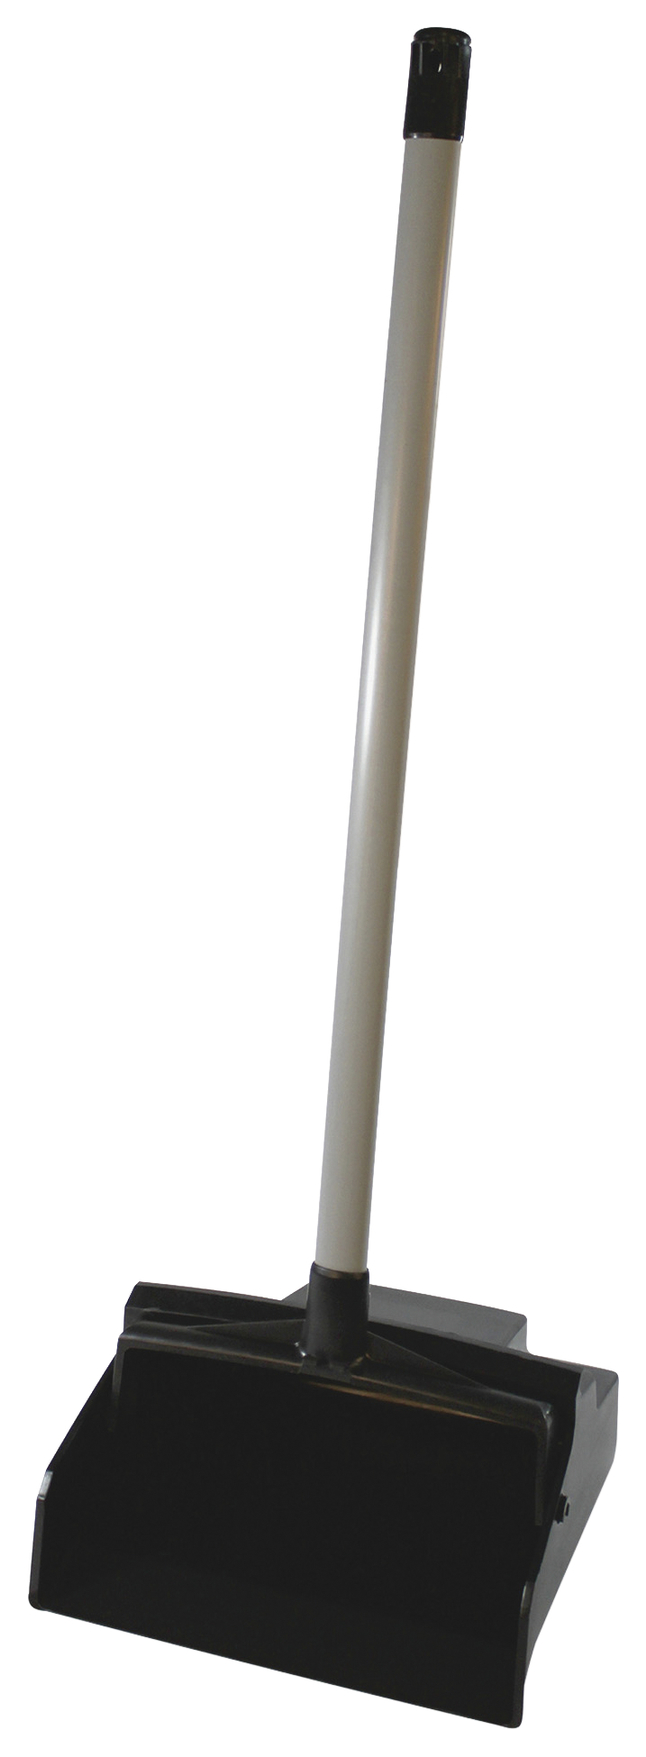 Mops, Brooms, Item Number 2009220